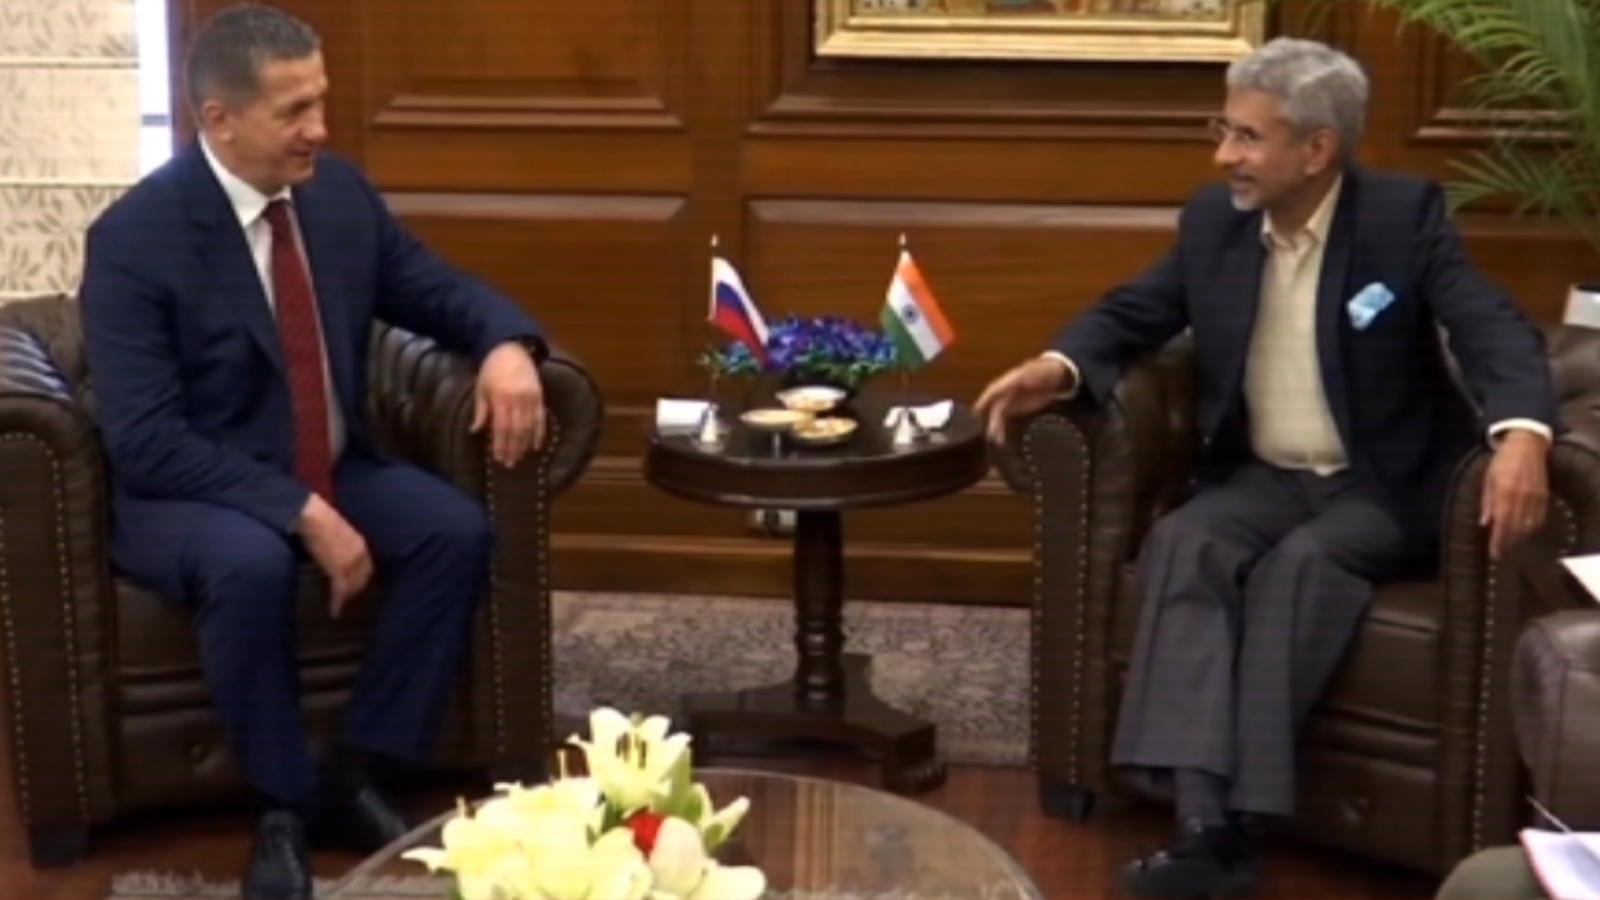 external-affairs-minister-s-jaishankar-meets-russian-deputy-pm-yury-trutnev